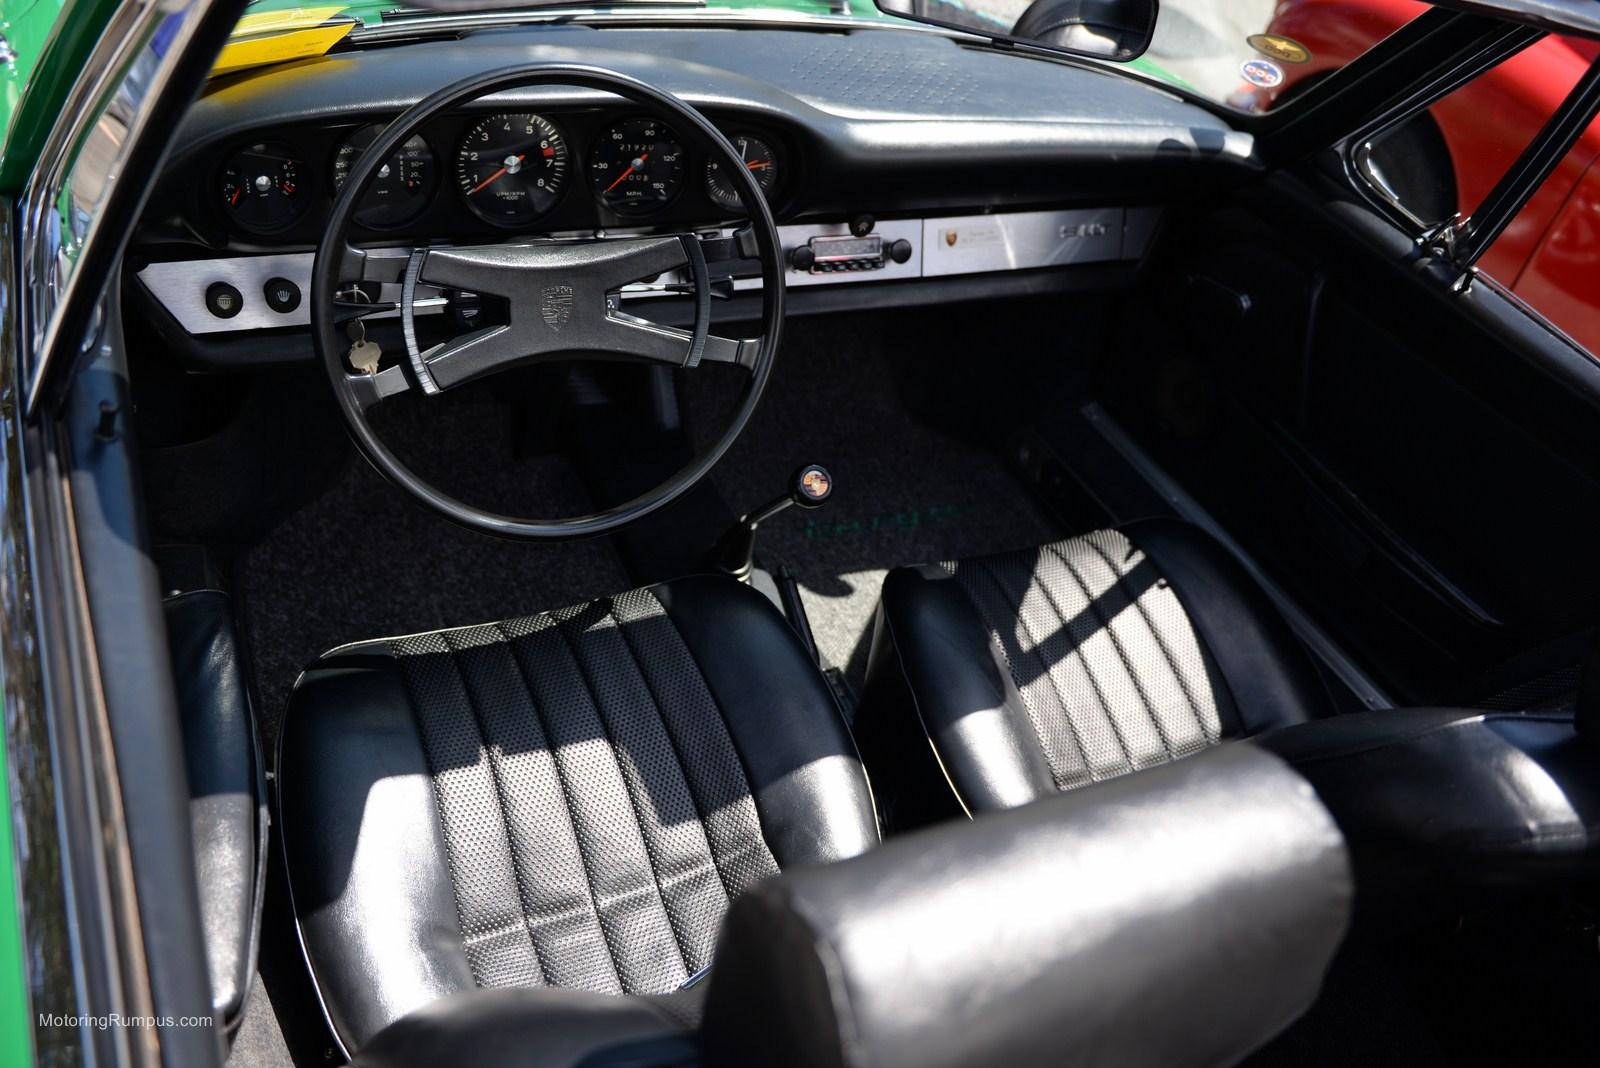 1986 porsche 911 interior gallery hd cars wallpaper 1986 porsche 911 targa images hd cars wallpaper 1986 porsche 911 targa images hd cars wallpaper vanachro Gallery